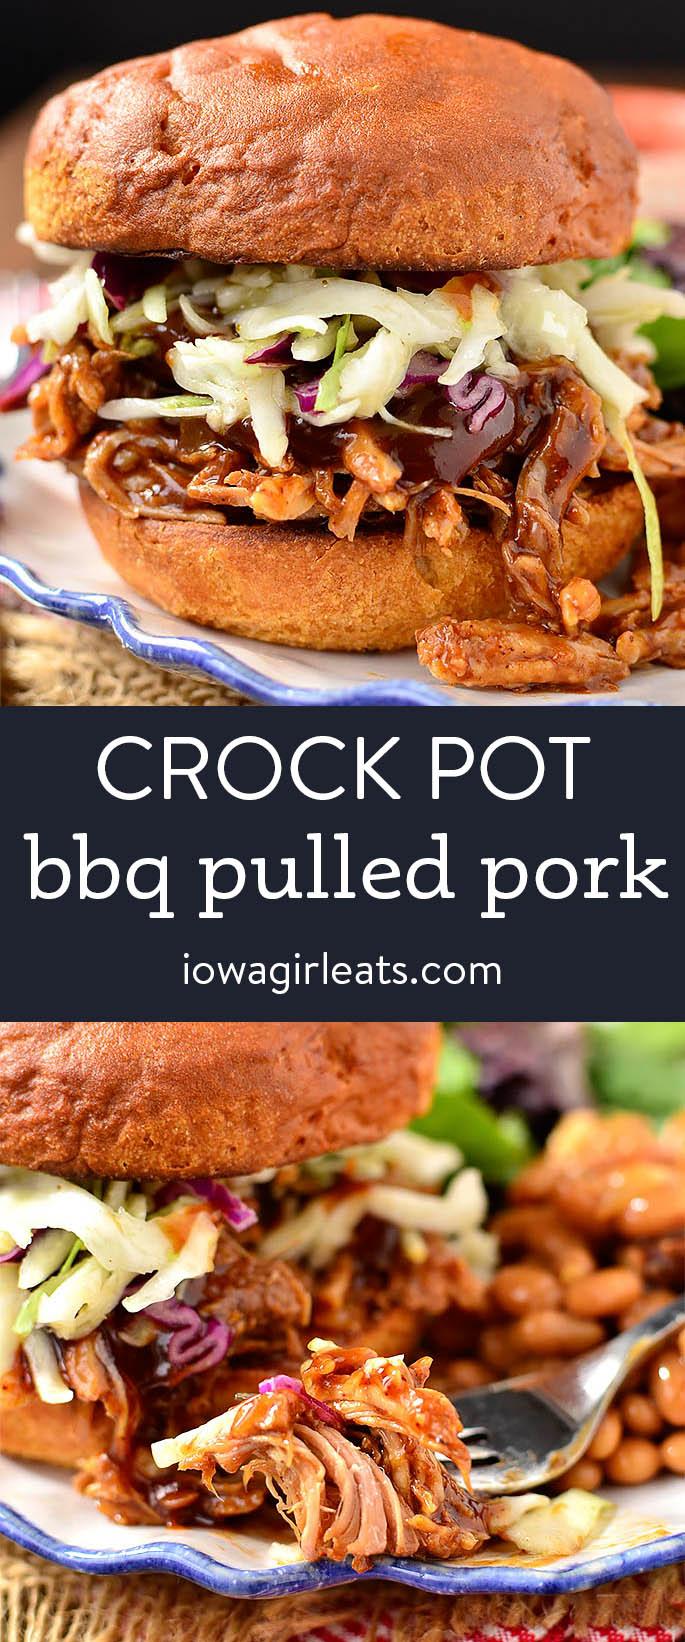 photo collage of crock pot bbq pulled pork